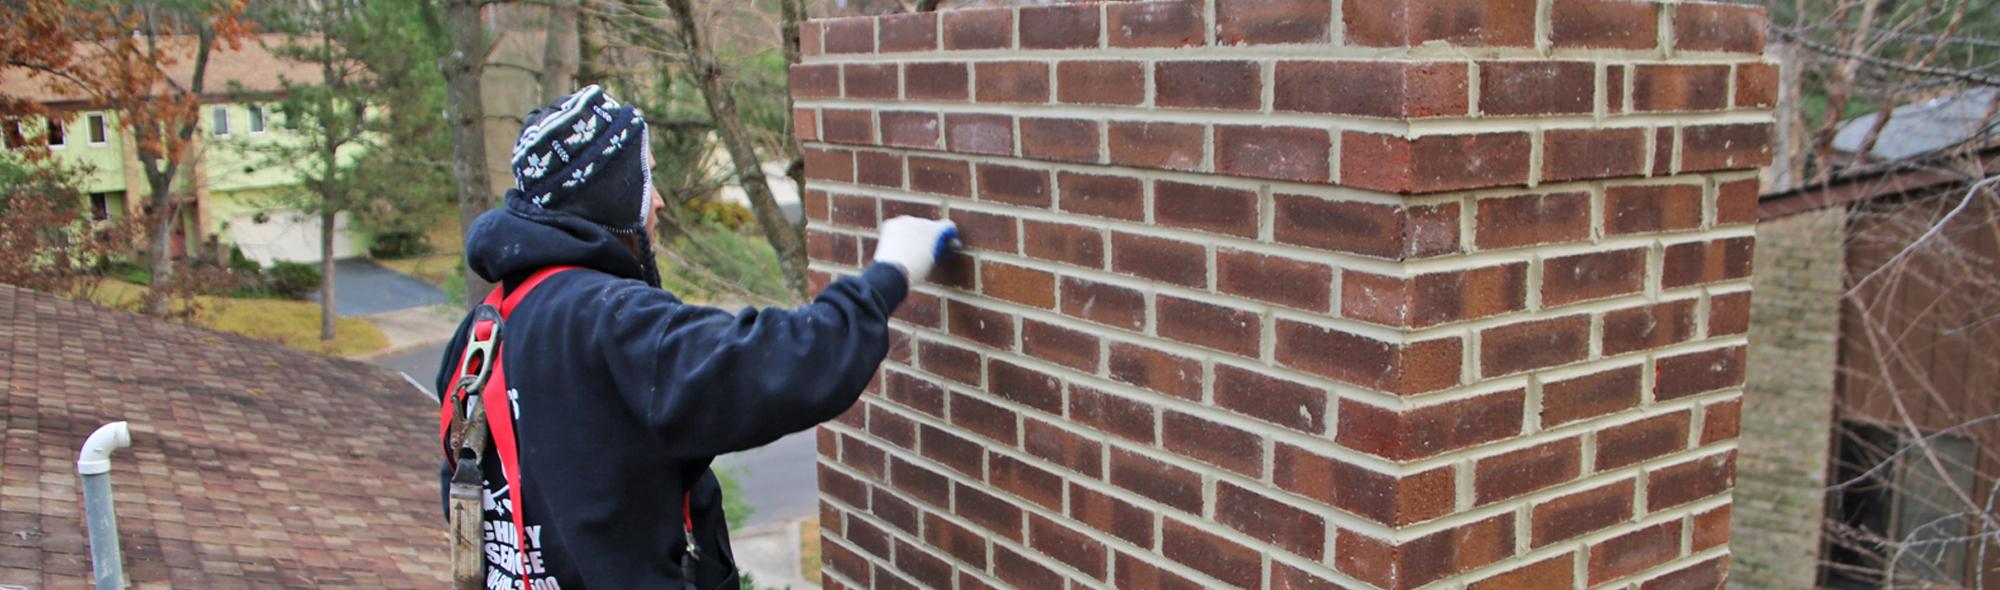 chimney repair for leaky chimney in Alexandria va